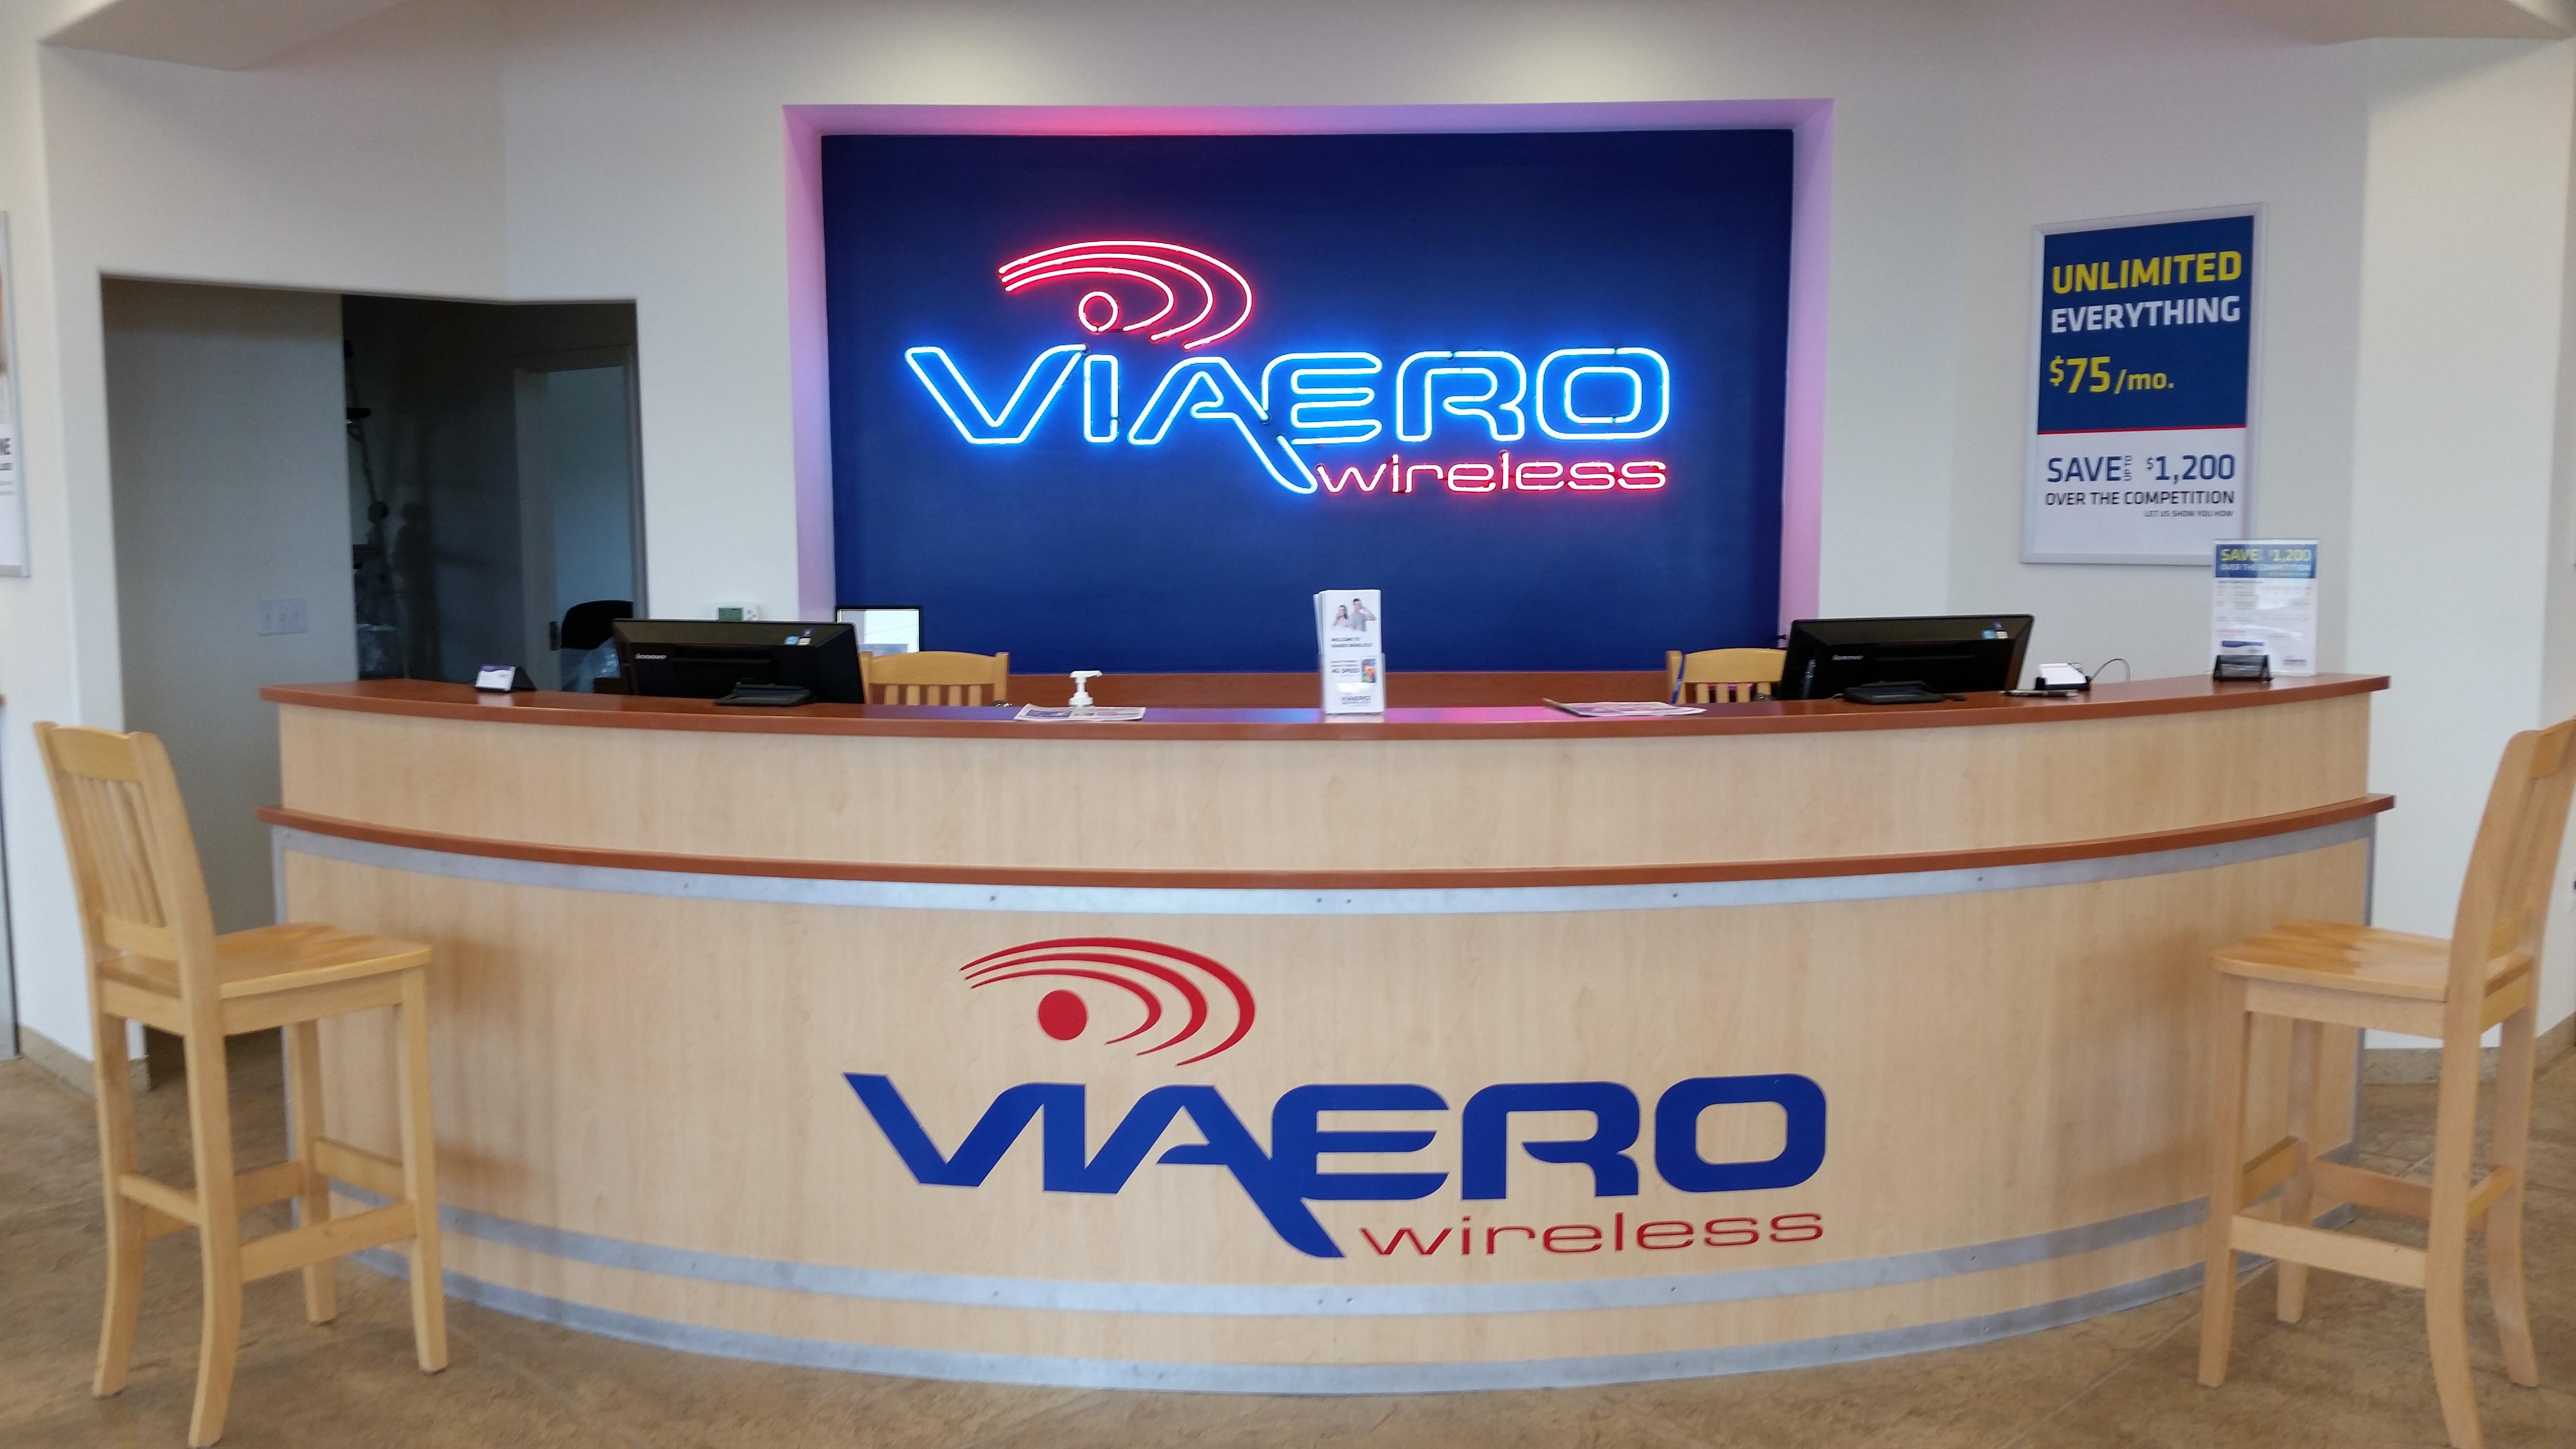 Viaero Wireless image 3